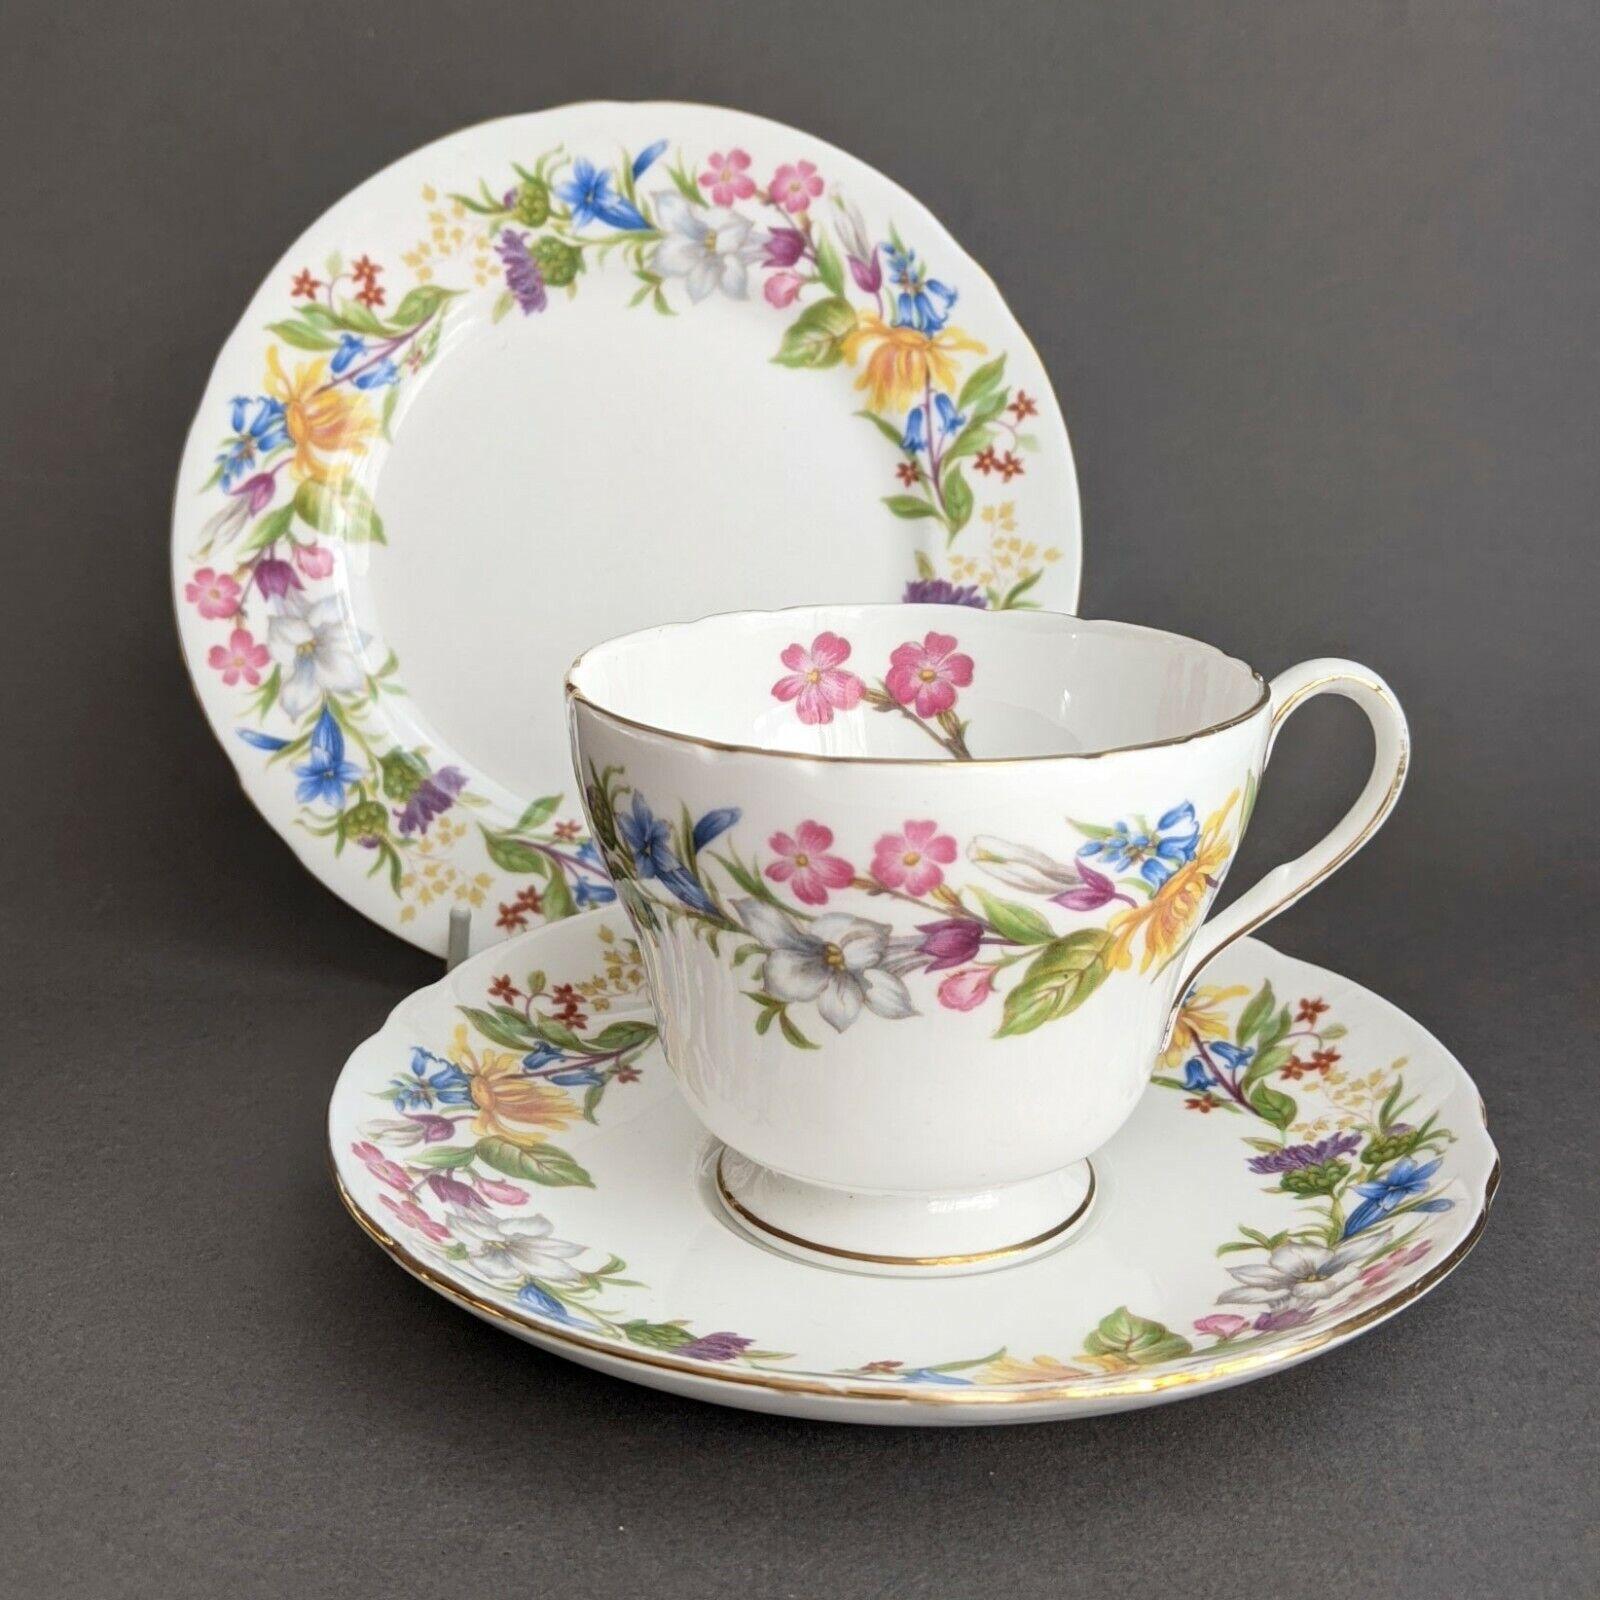 Image 1 - Shelley Spring Bouquet Tea Trio (Tea Cup, Saucer, Side Plate)